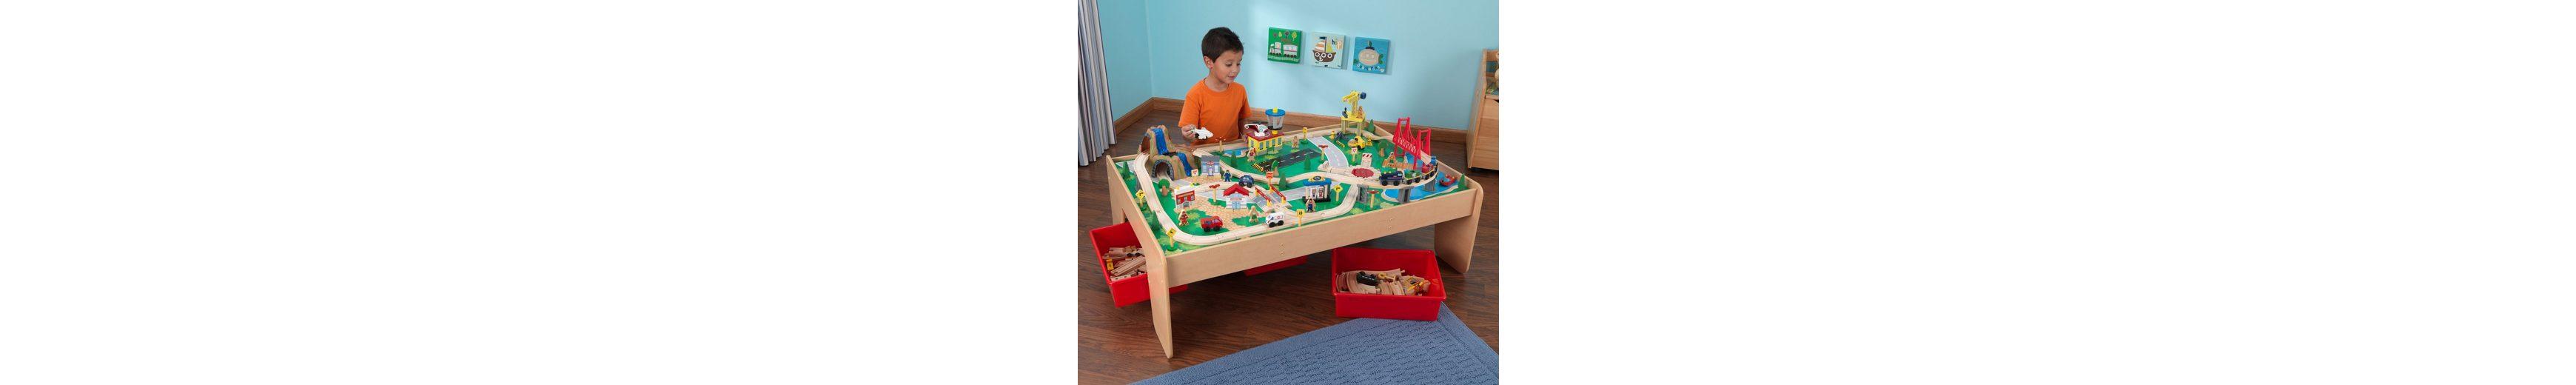 KidKraft® Eisenbahnset, »Eisenbahnset + Spielplatte«